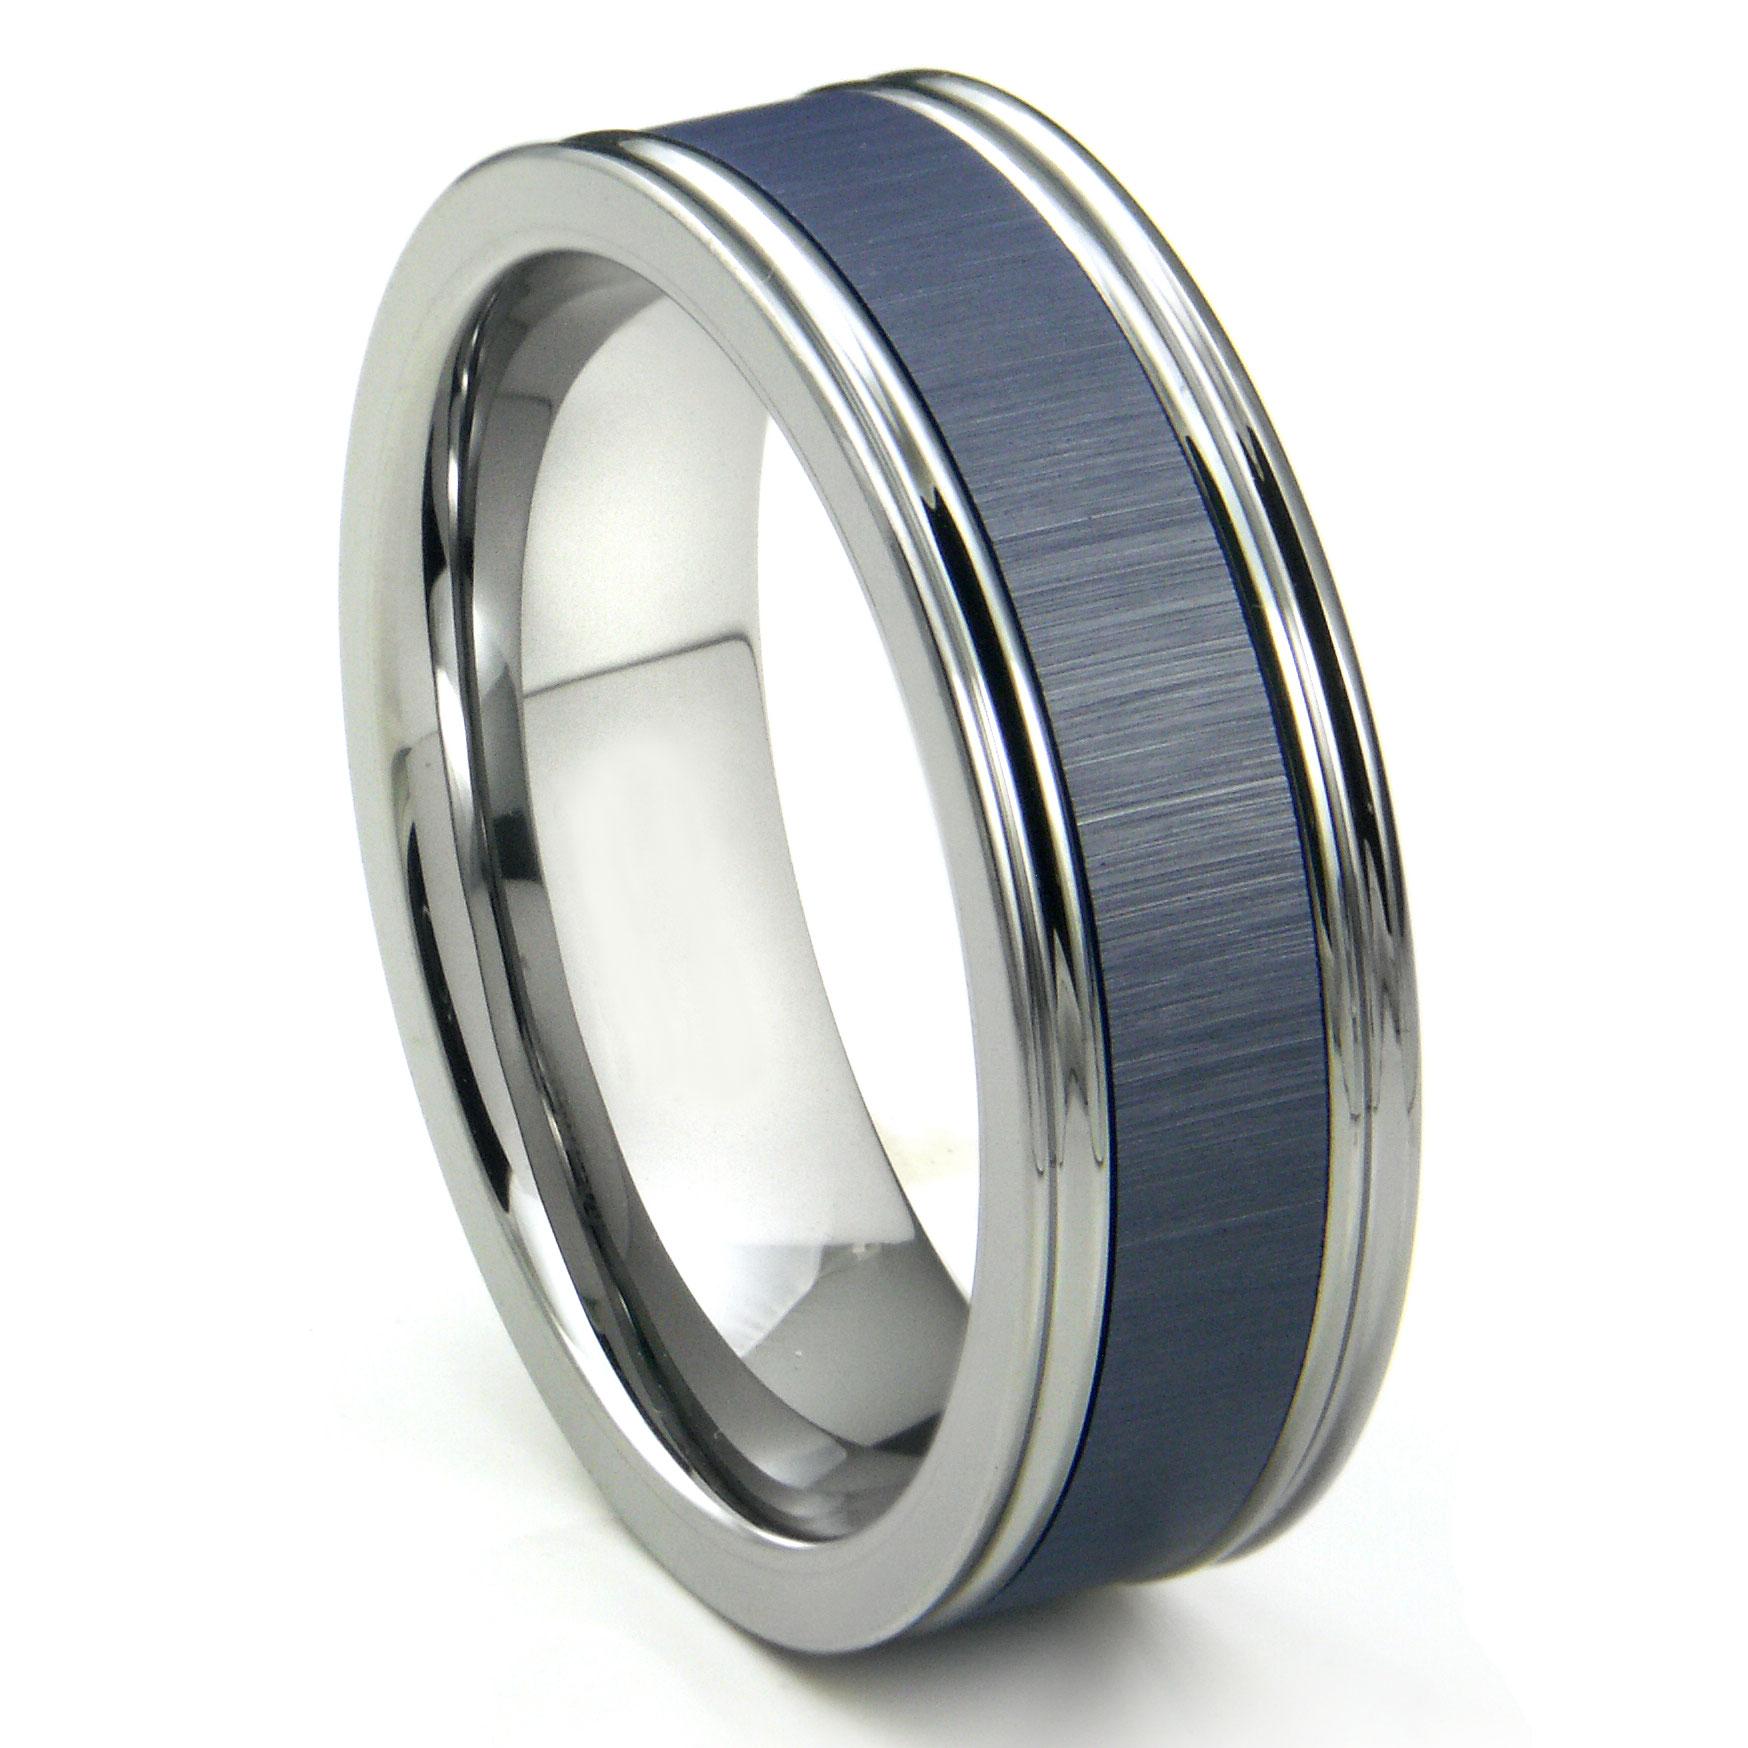 Mens Tungsten Carbide Rings tungsten hammered wedding band Tungsten Carbide Blue Ceramic Inlay Wedding Band Ring w Horizontal Satin Finish